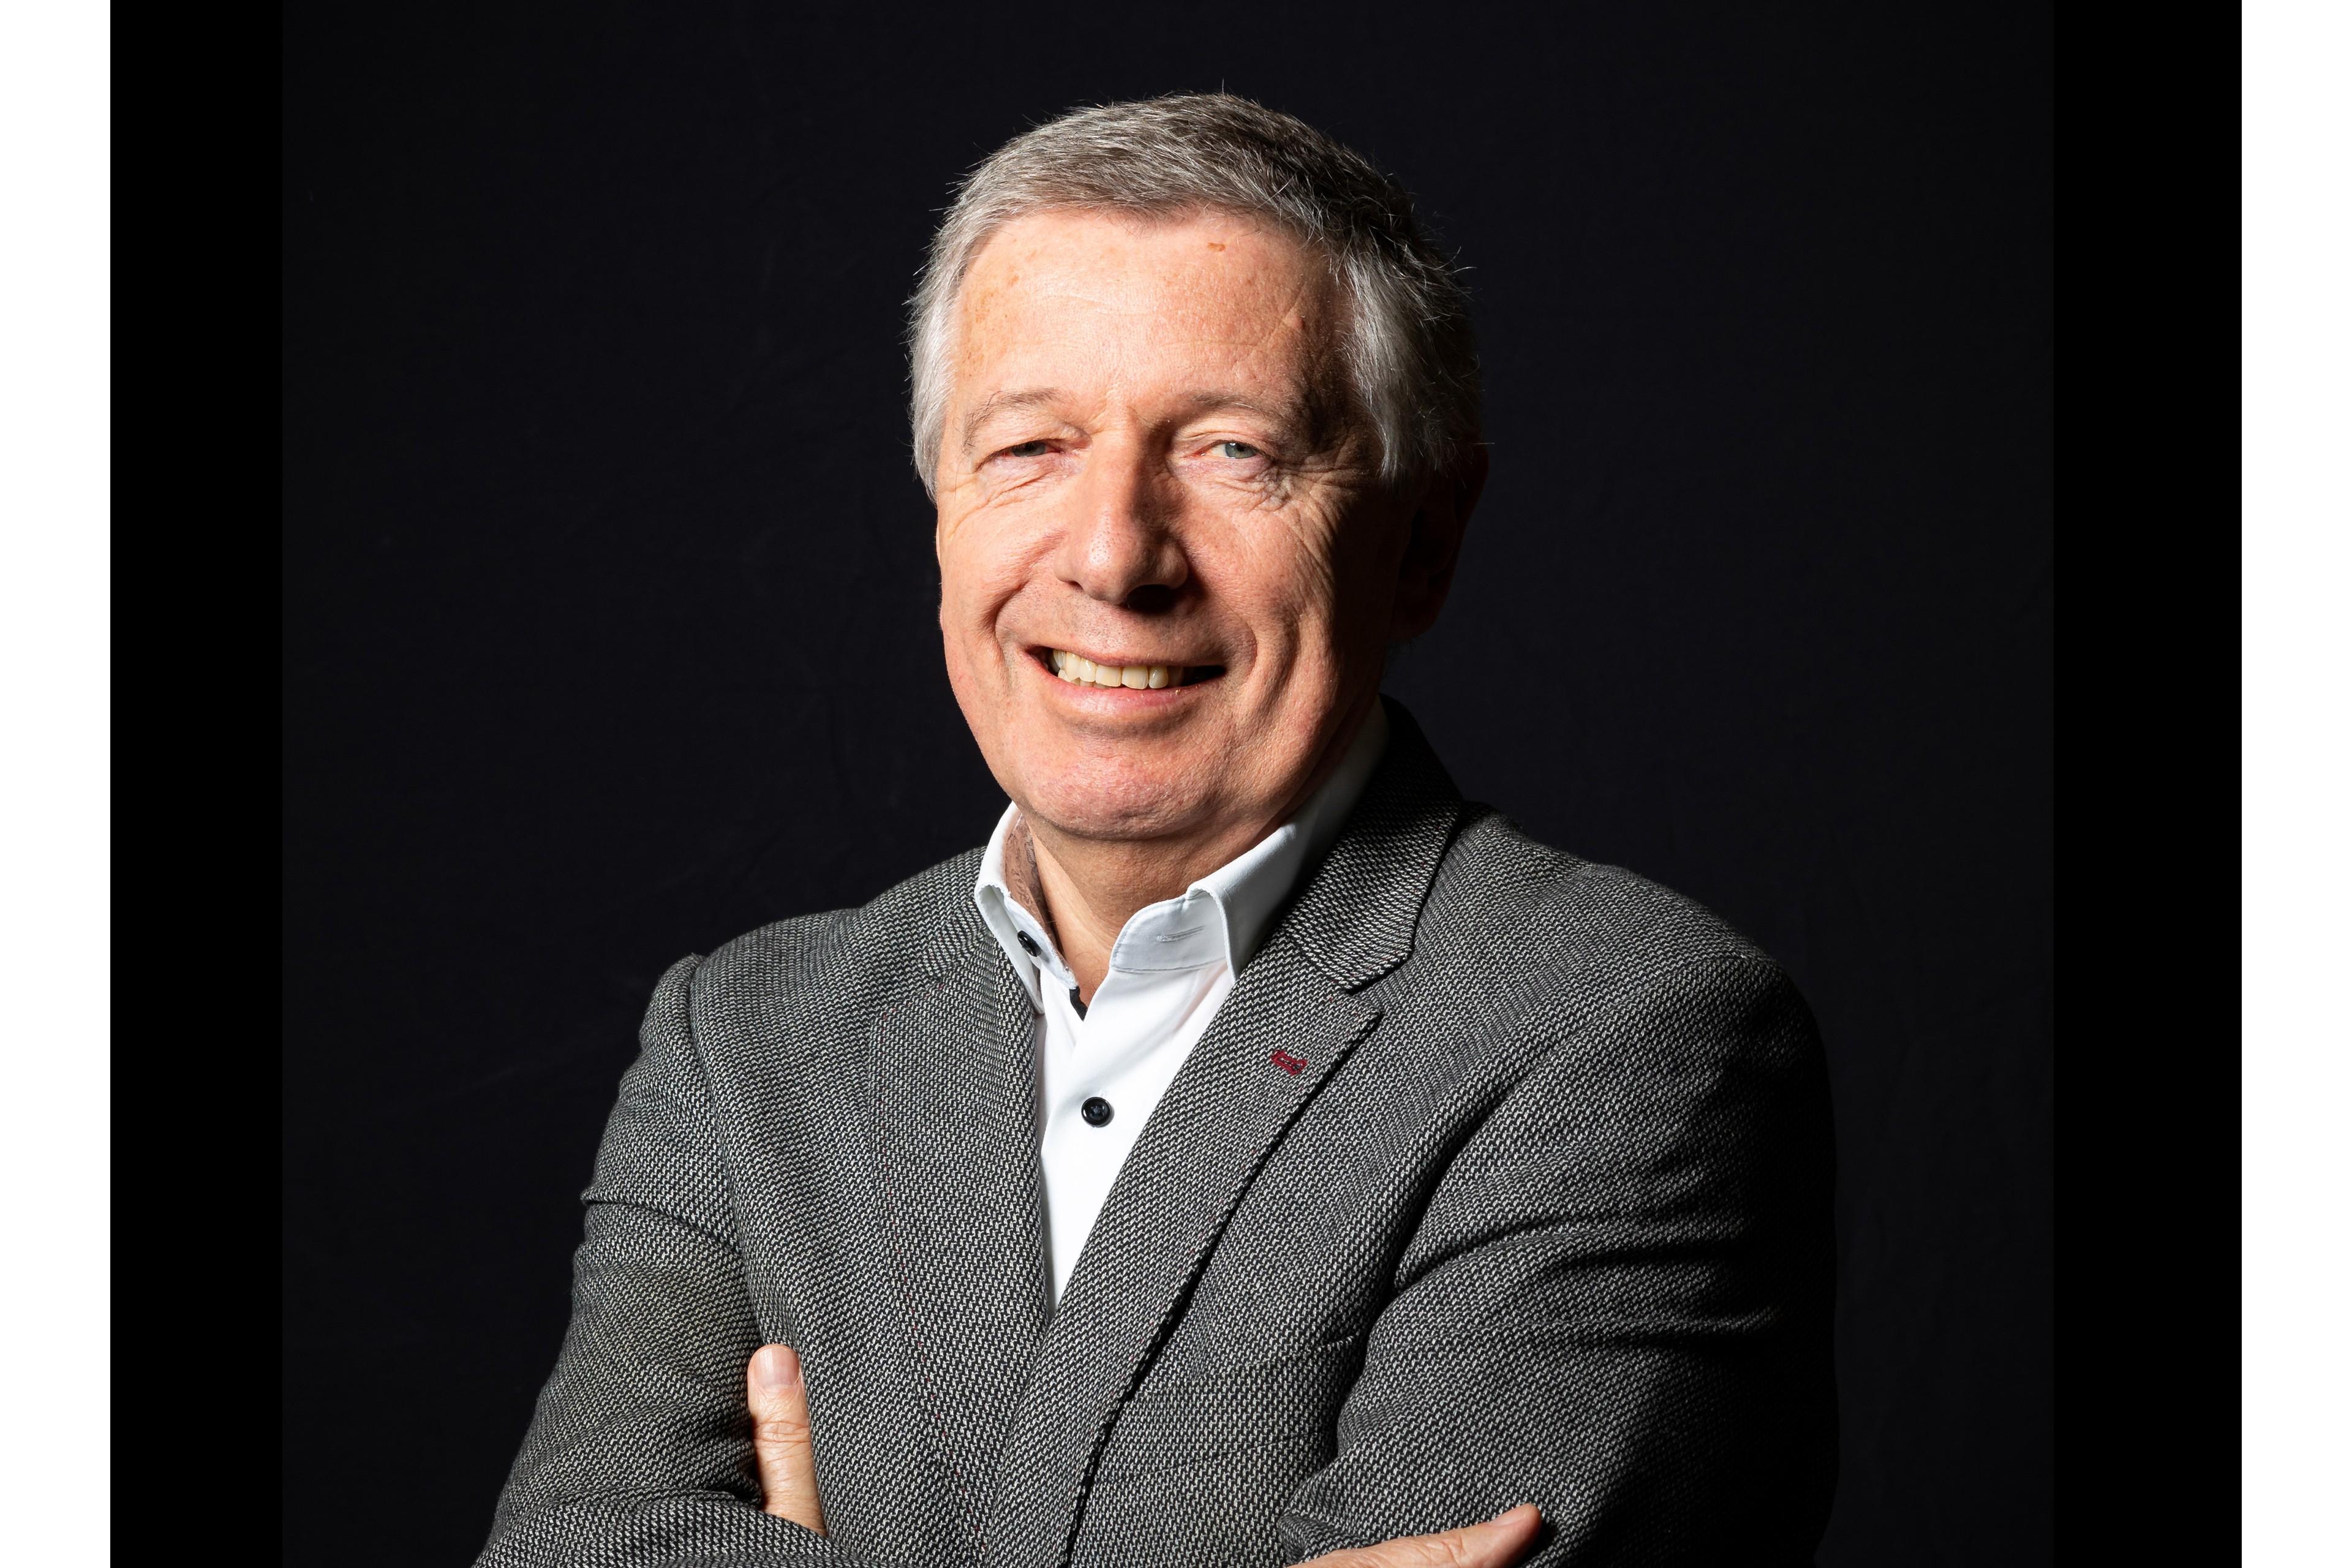 Paul Koppert